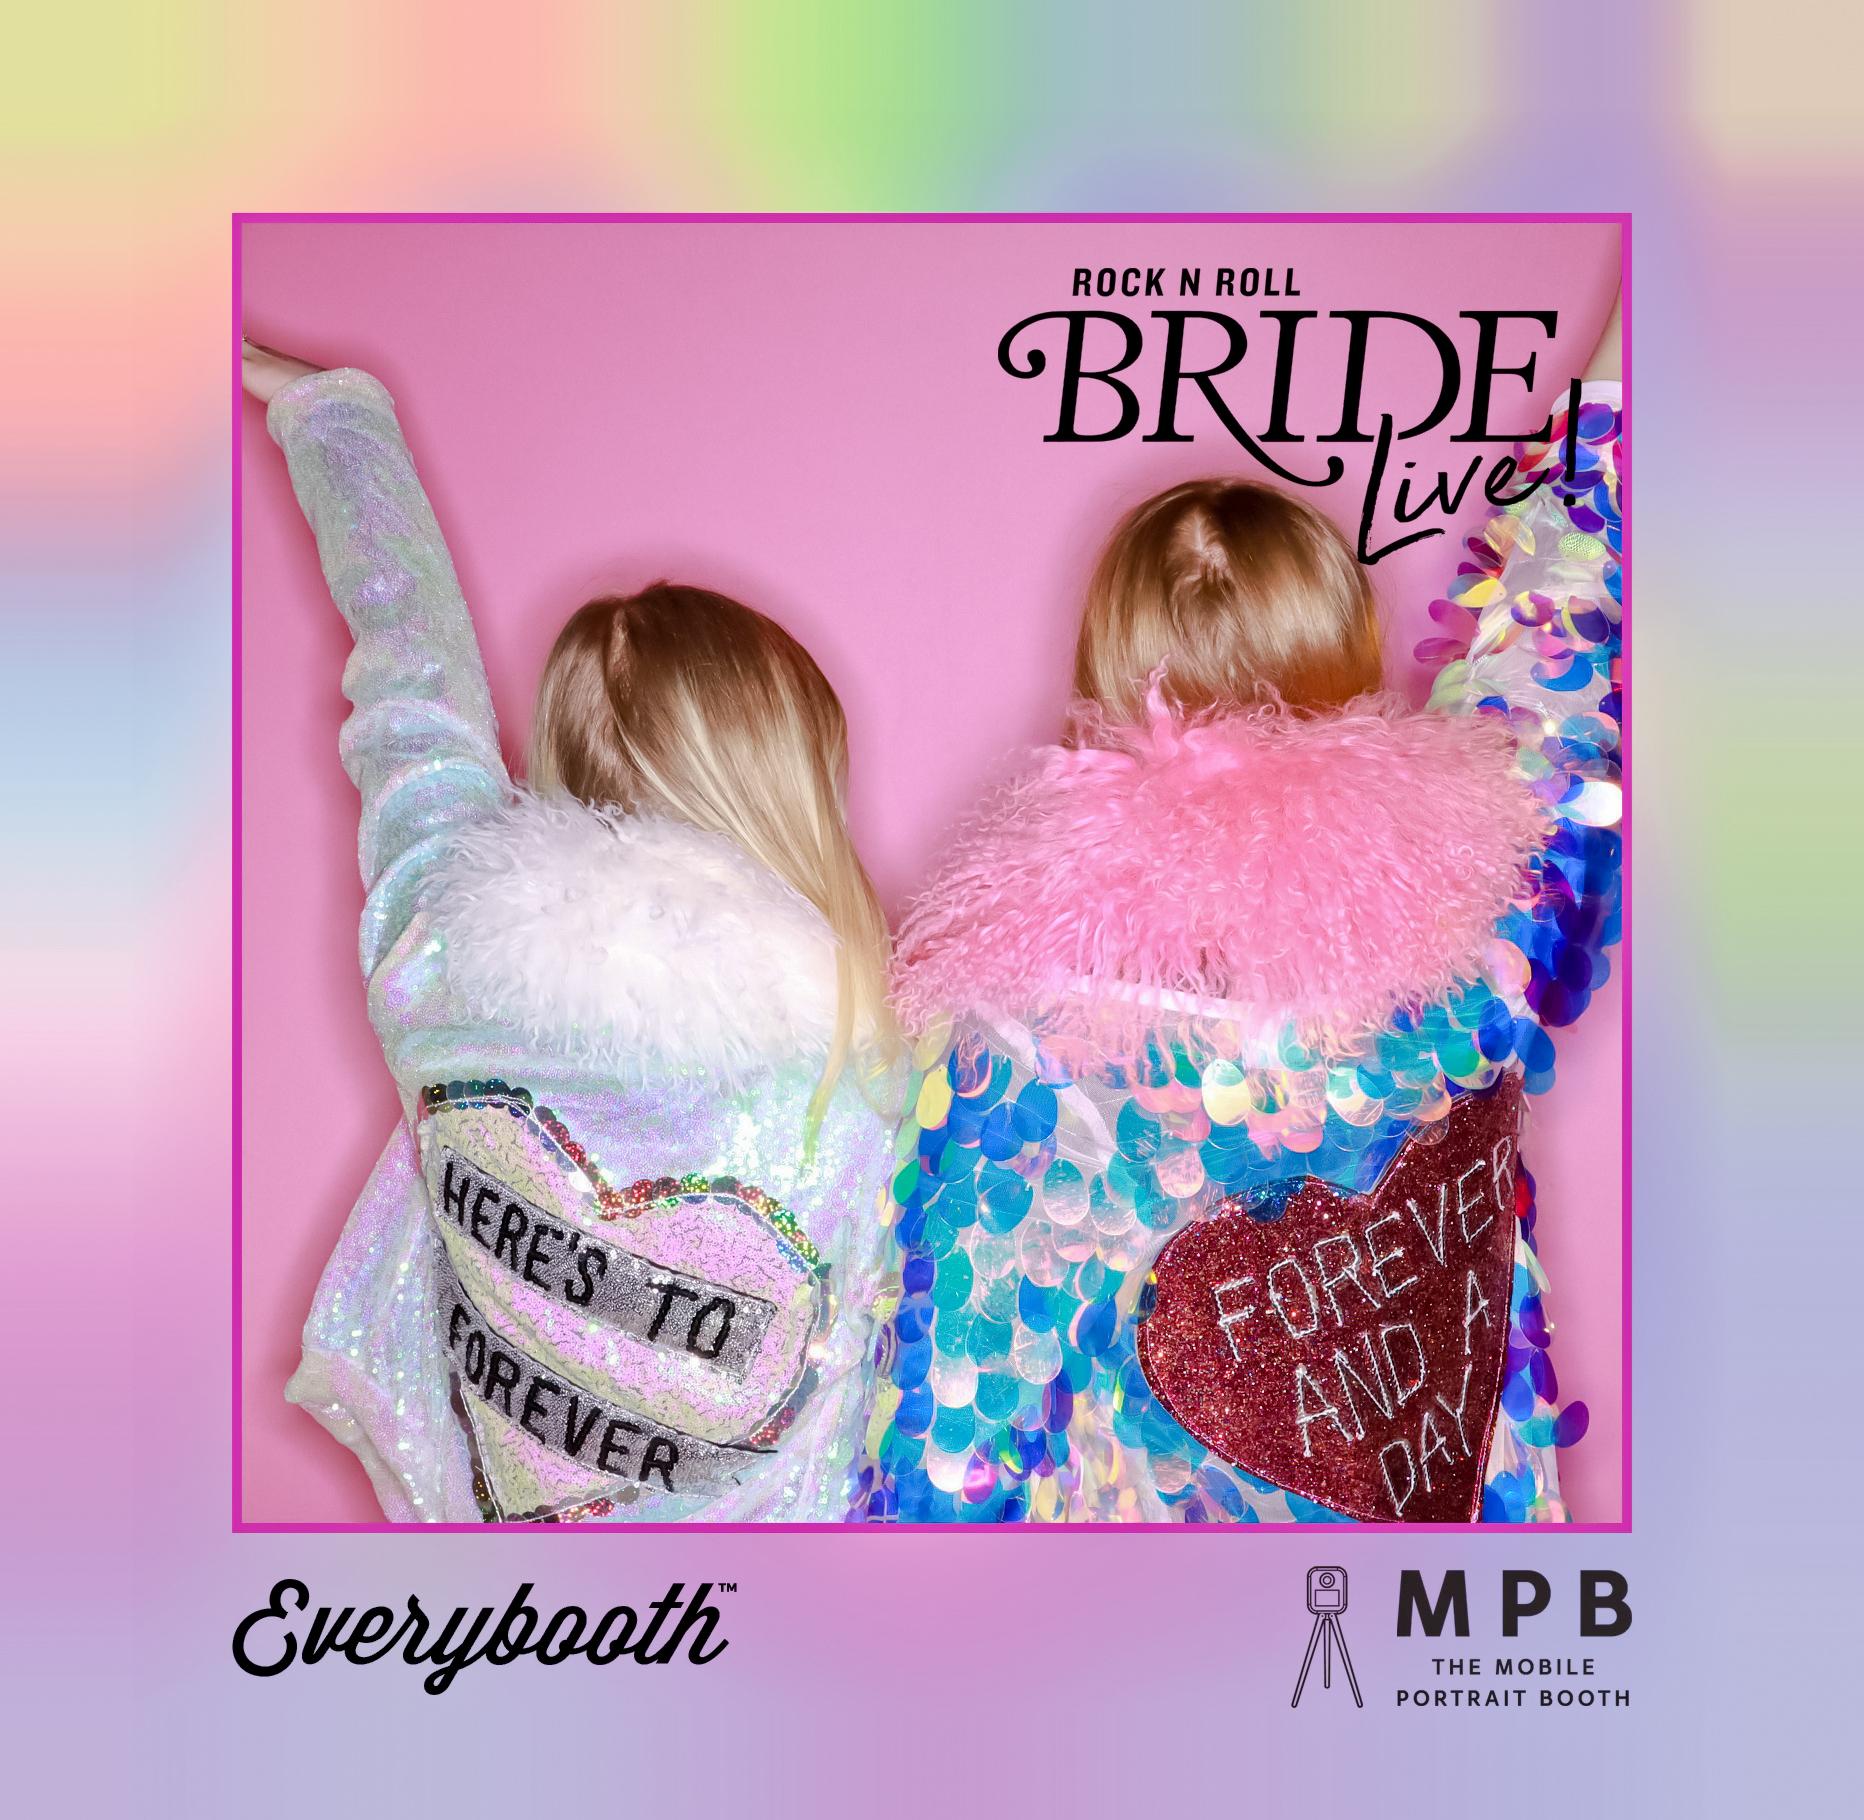 rock n roll bride live